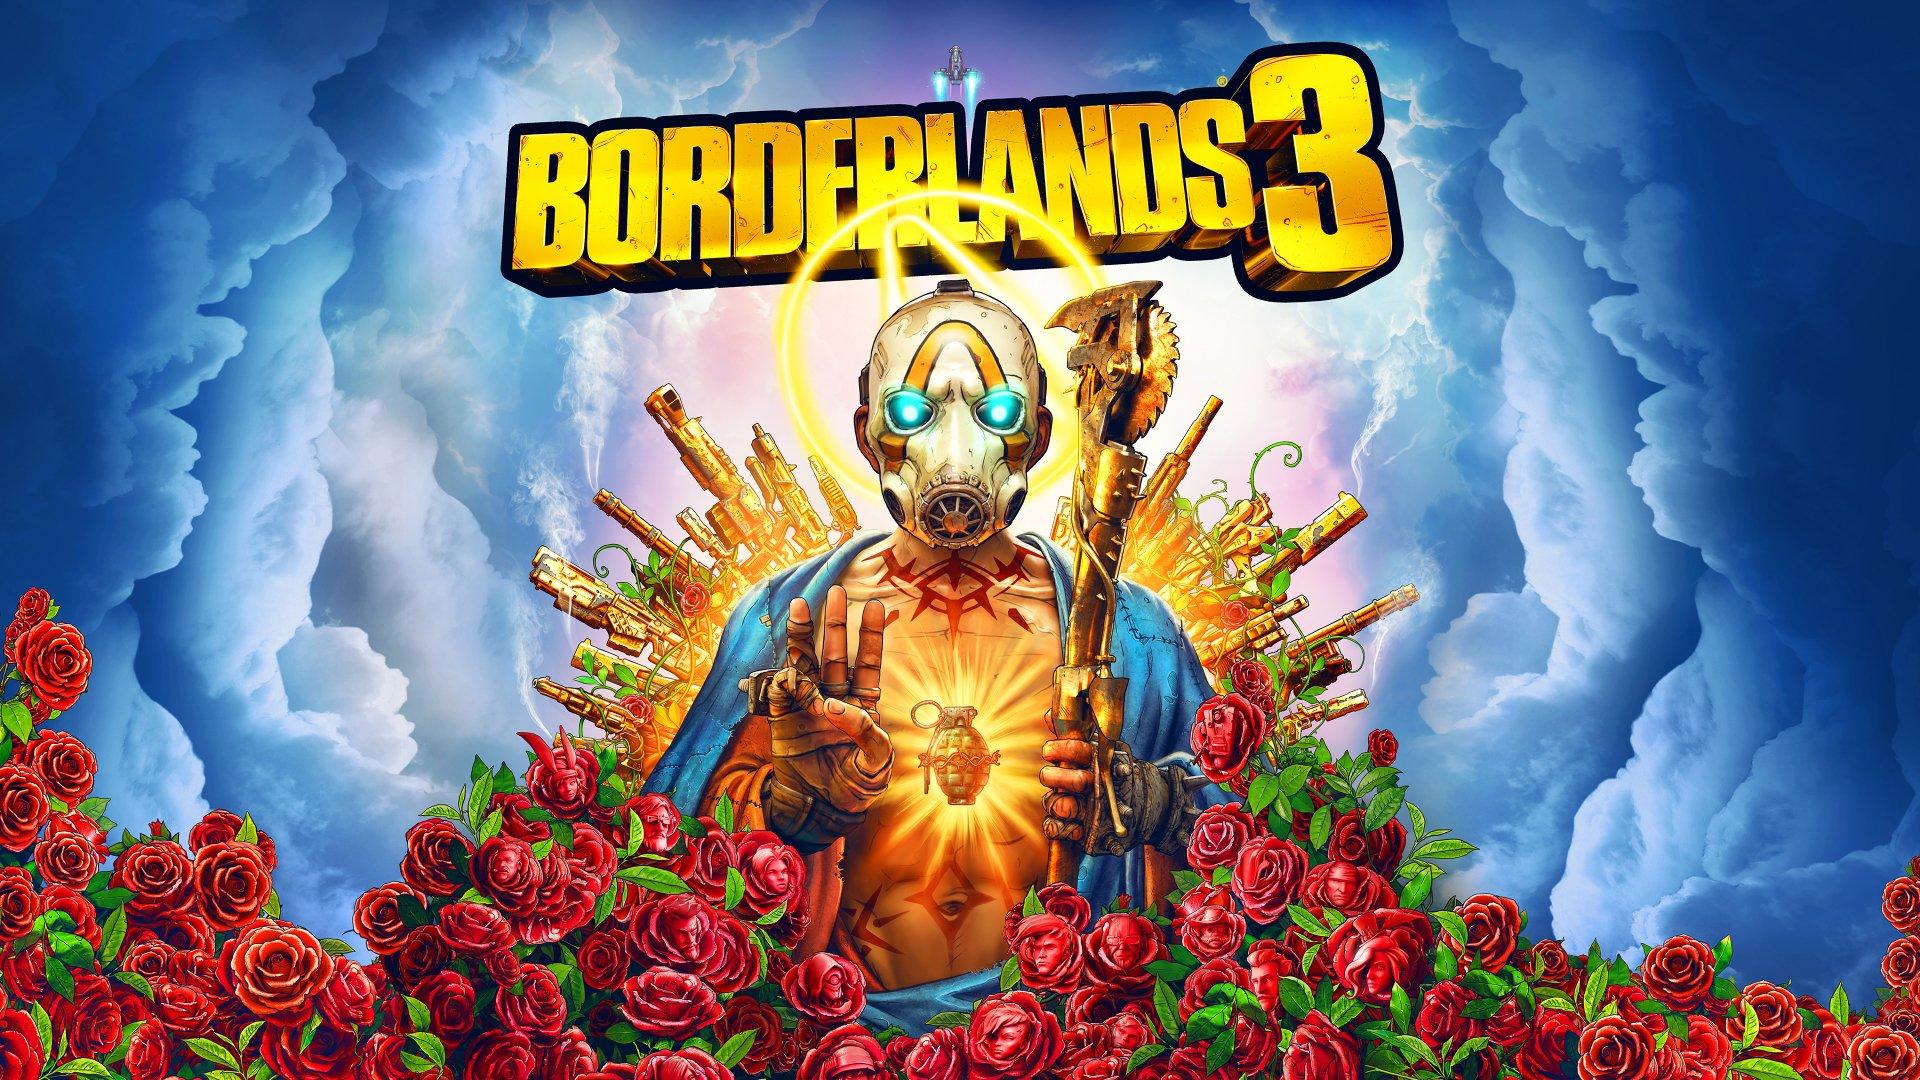 Borderlands 3 wallpaper HD